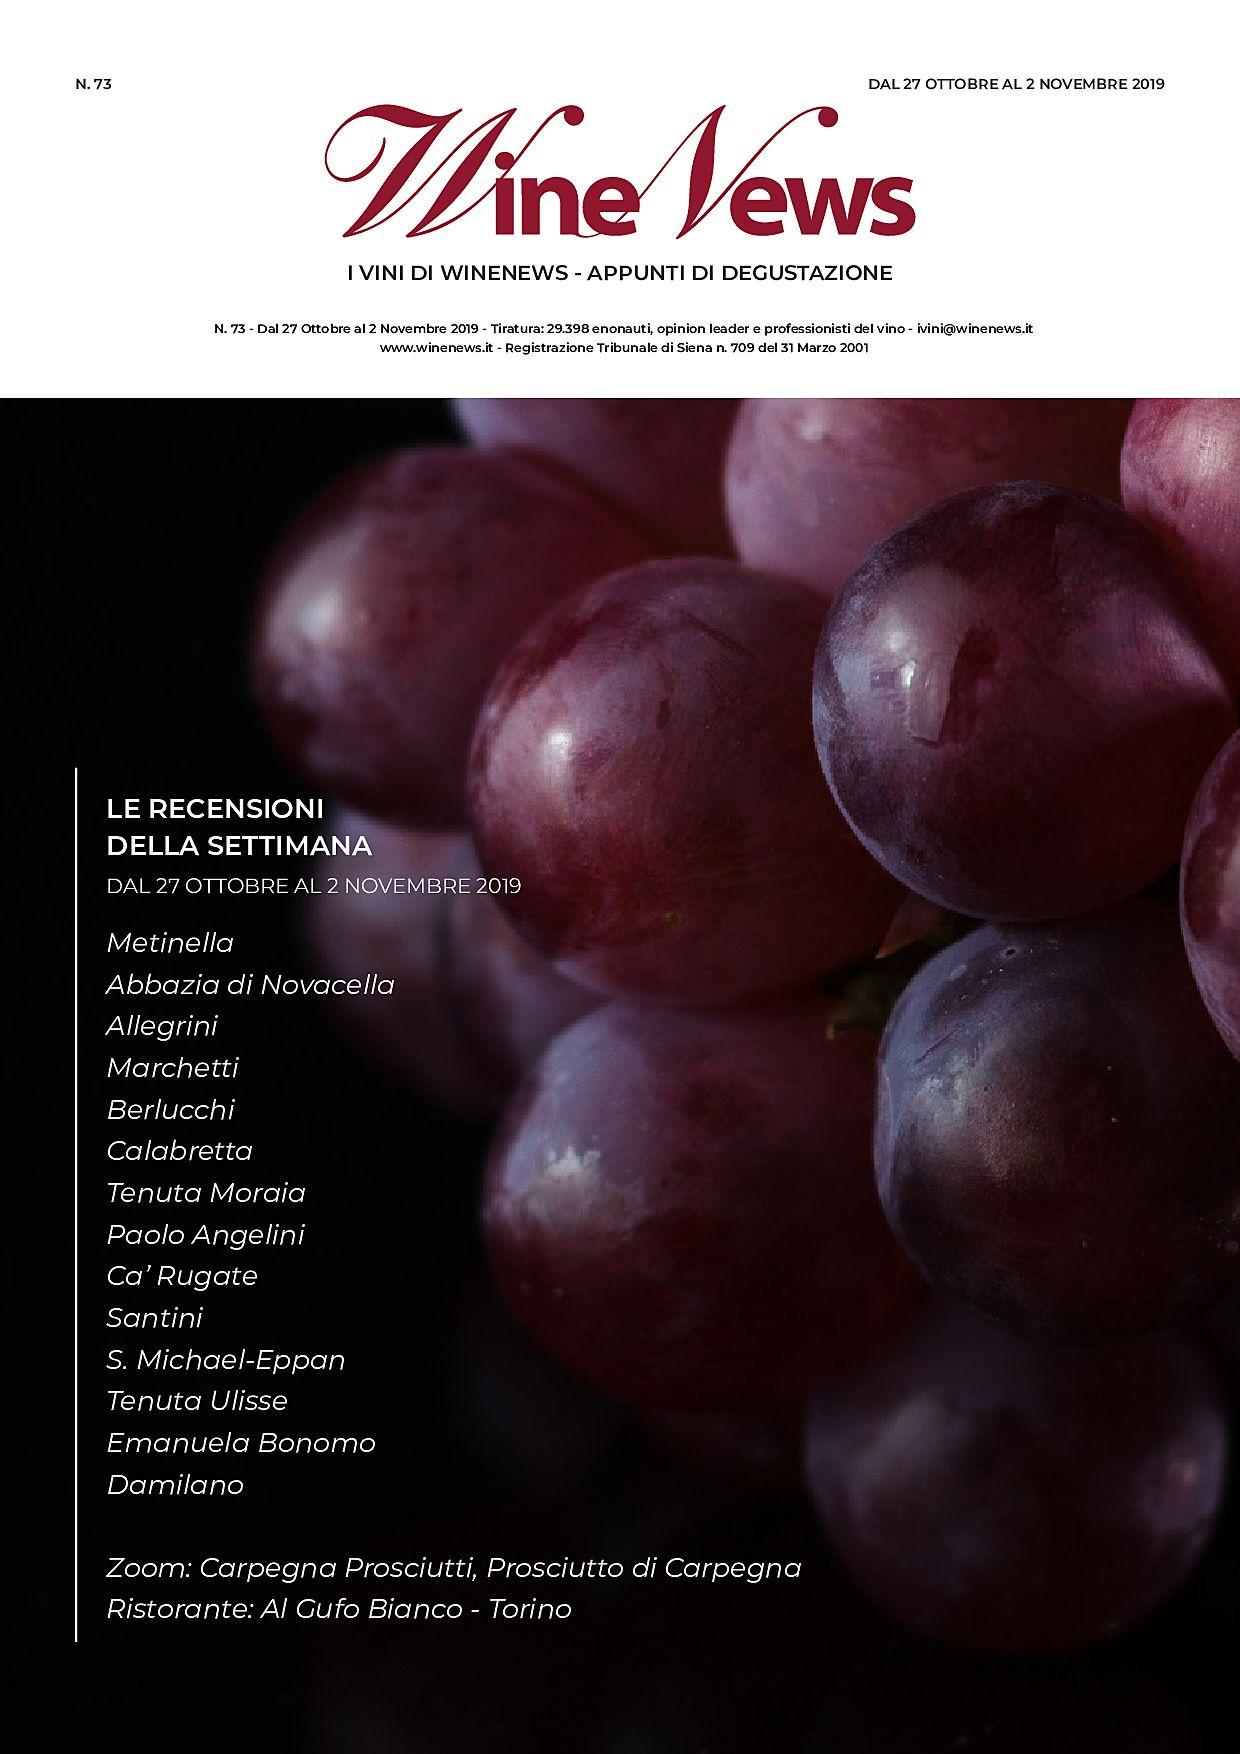 https://winenews.it/php/redirect_pdf.php?id=402212&t=1572018999